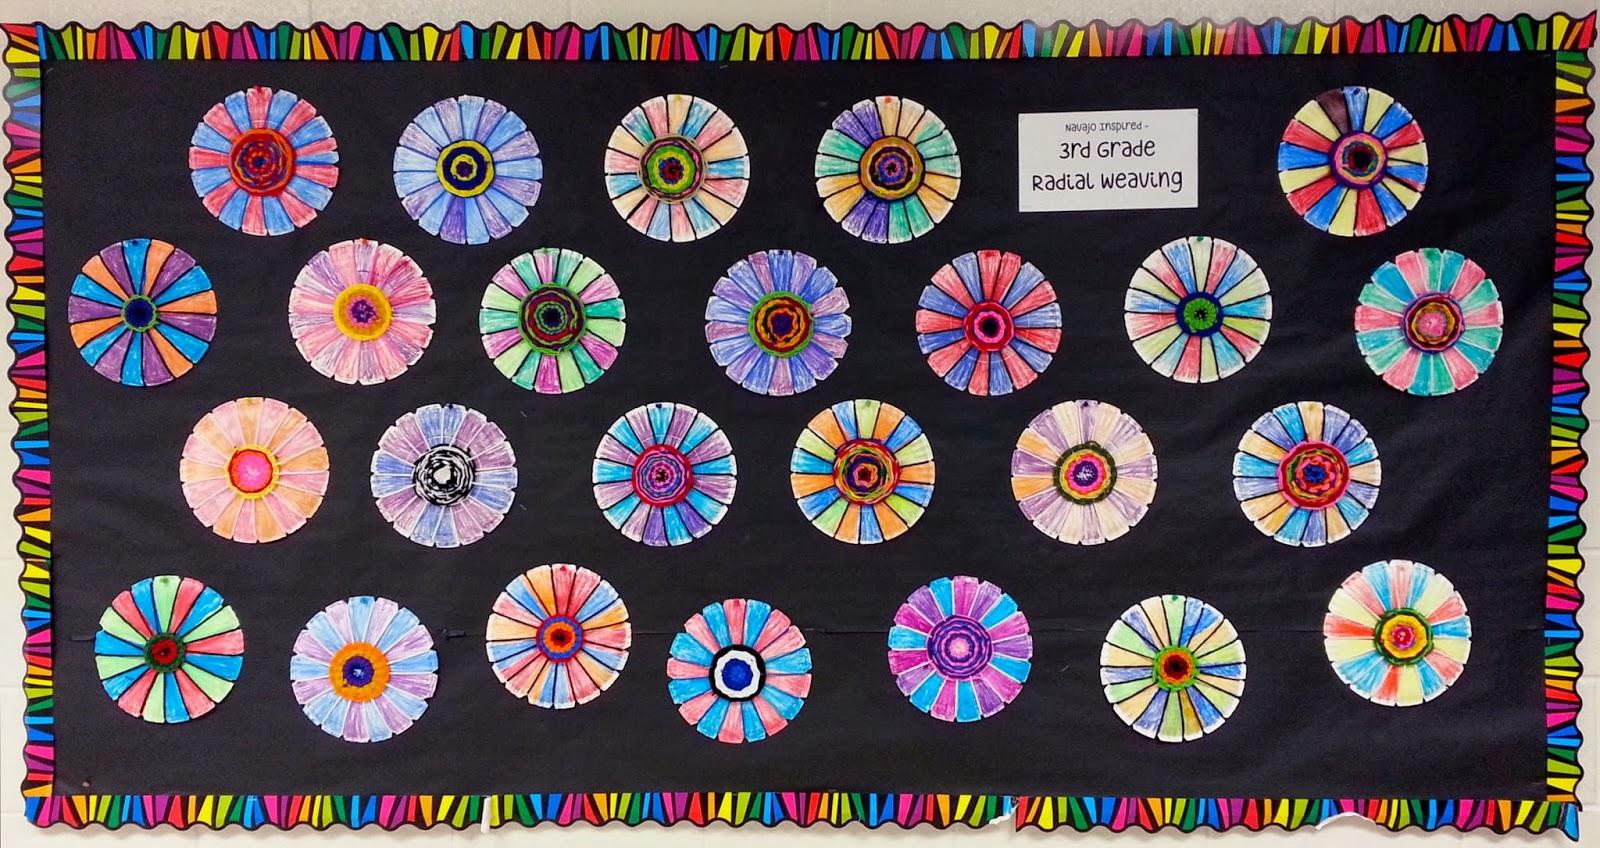 Artistic Symmetrical Ideas Early Elementary Up Through Fifth Grade